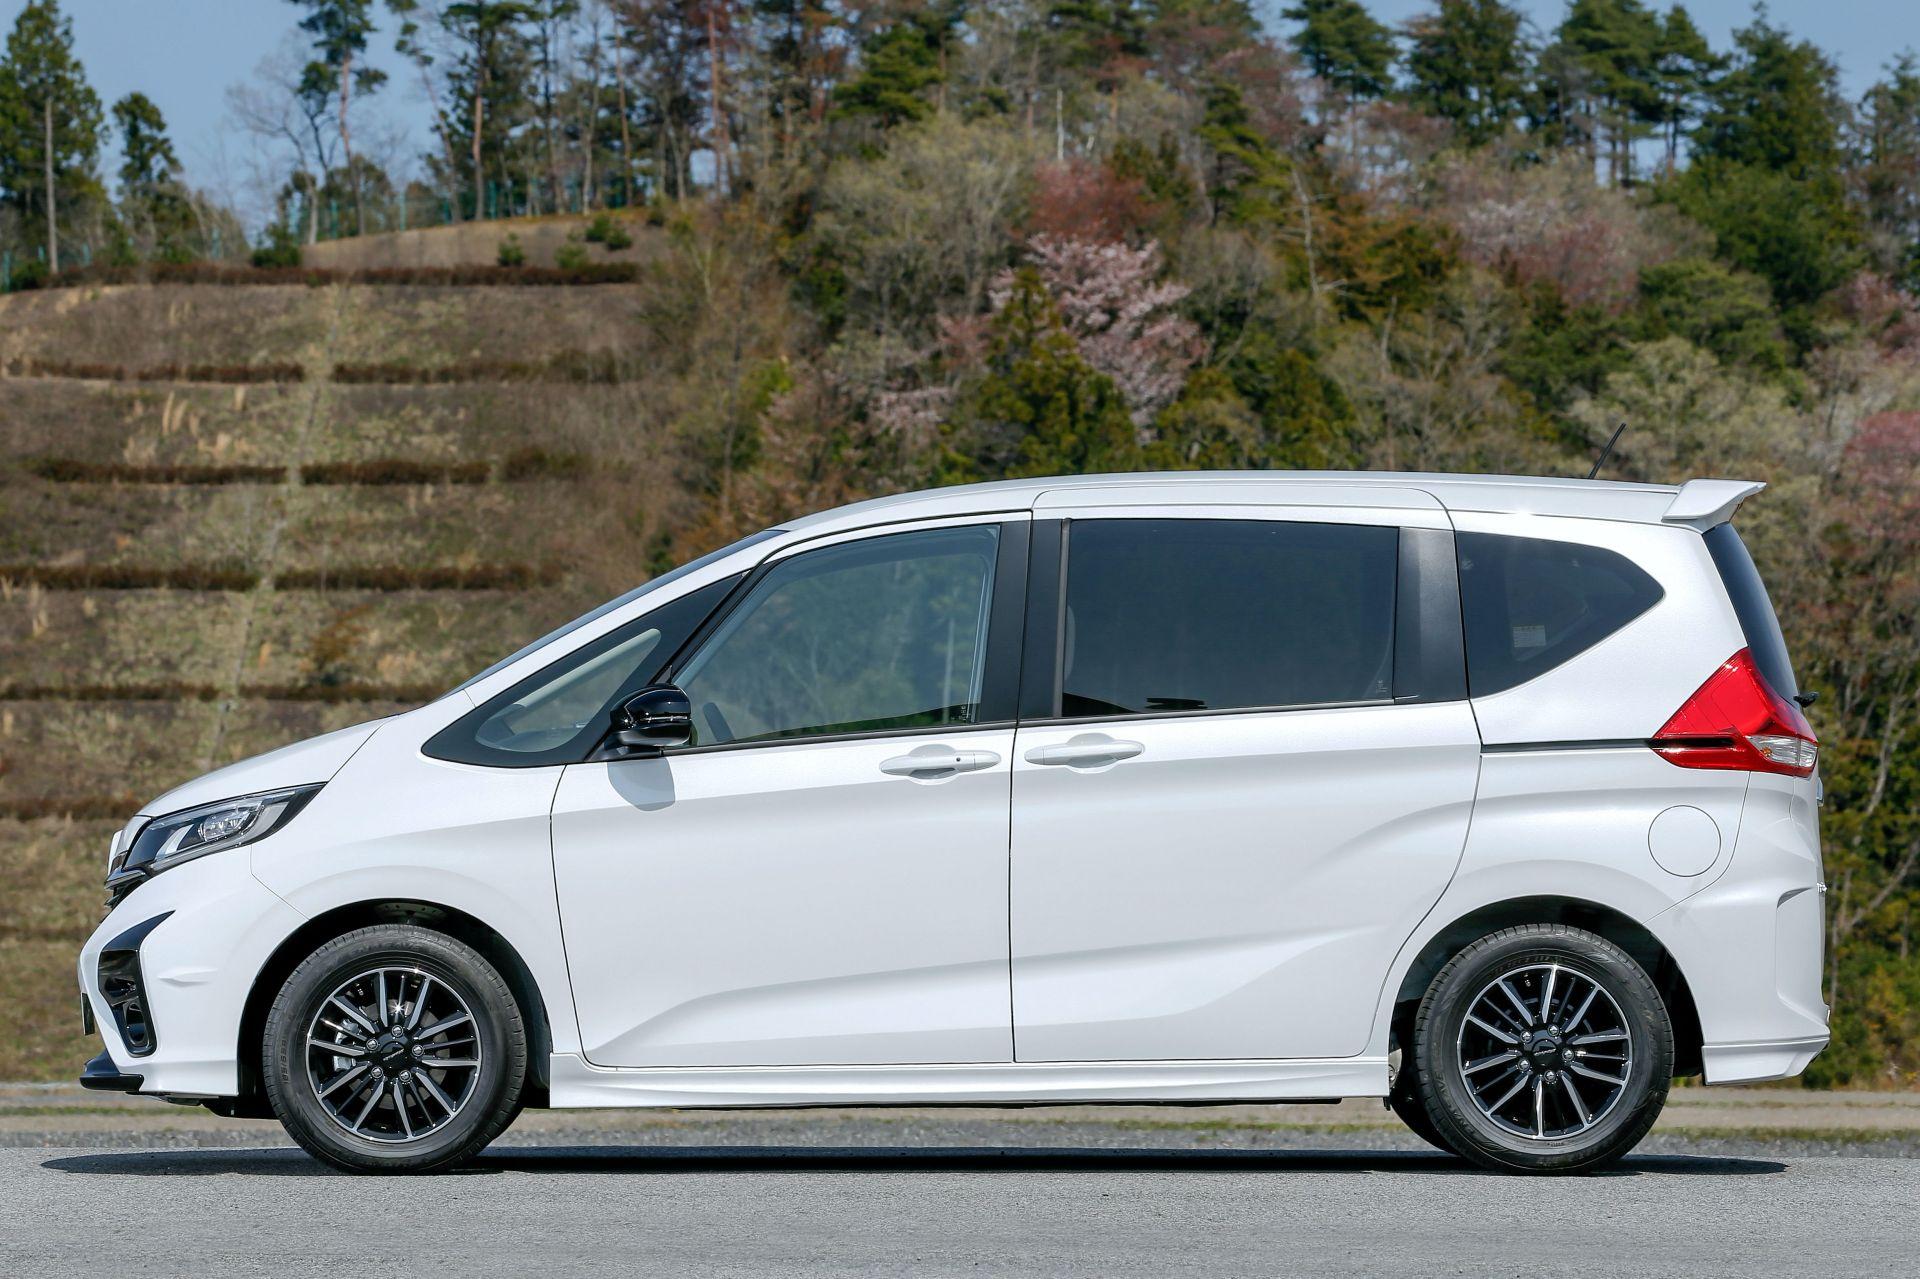 Honda-Freed-Modulo-X-Facelift-2020-27